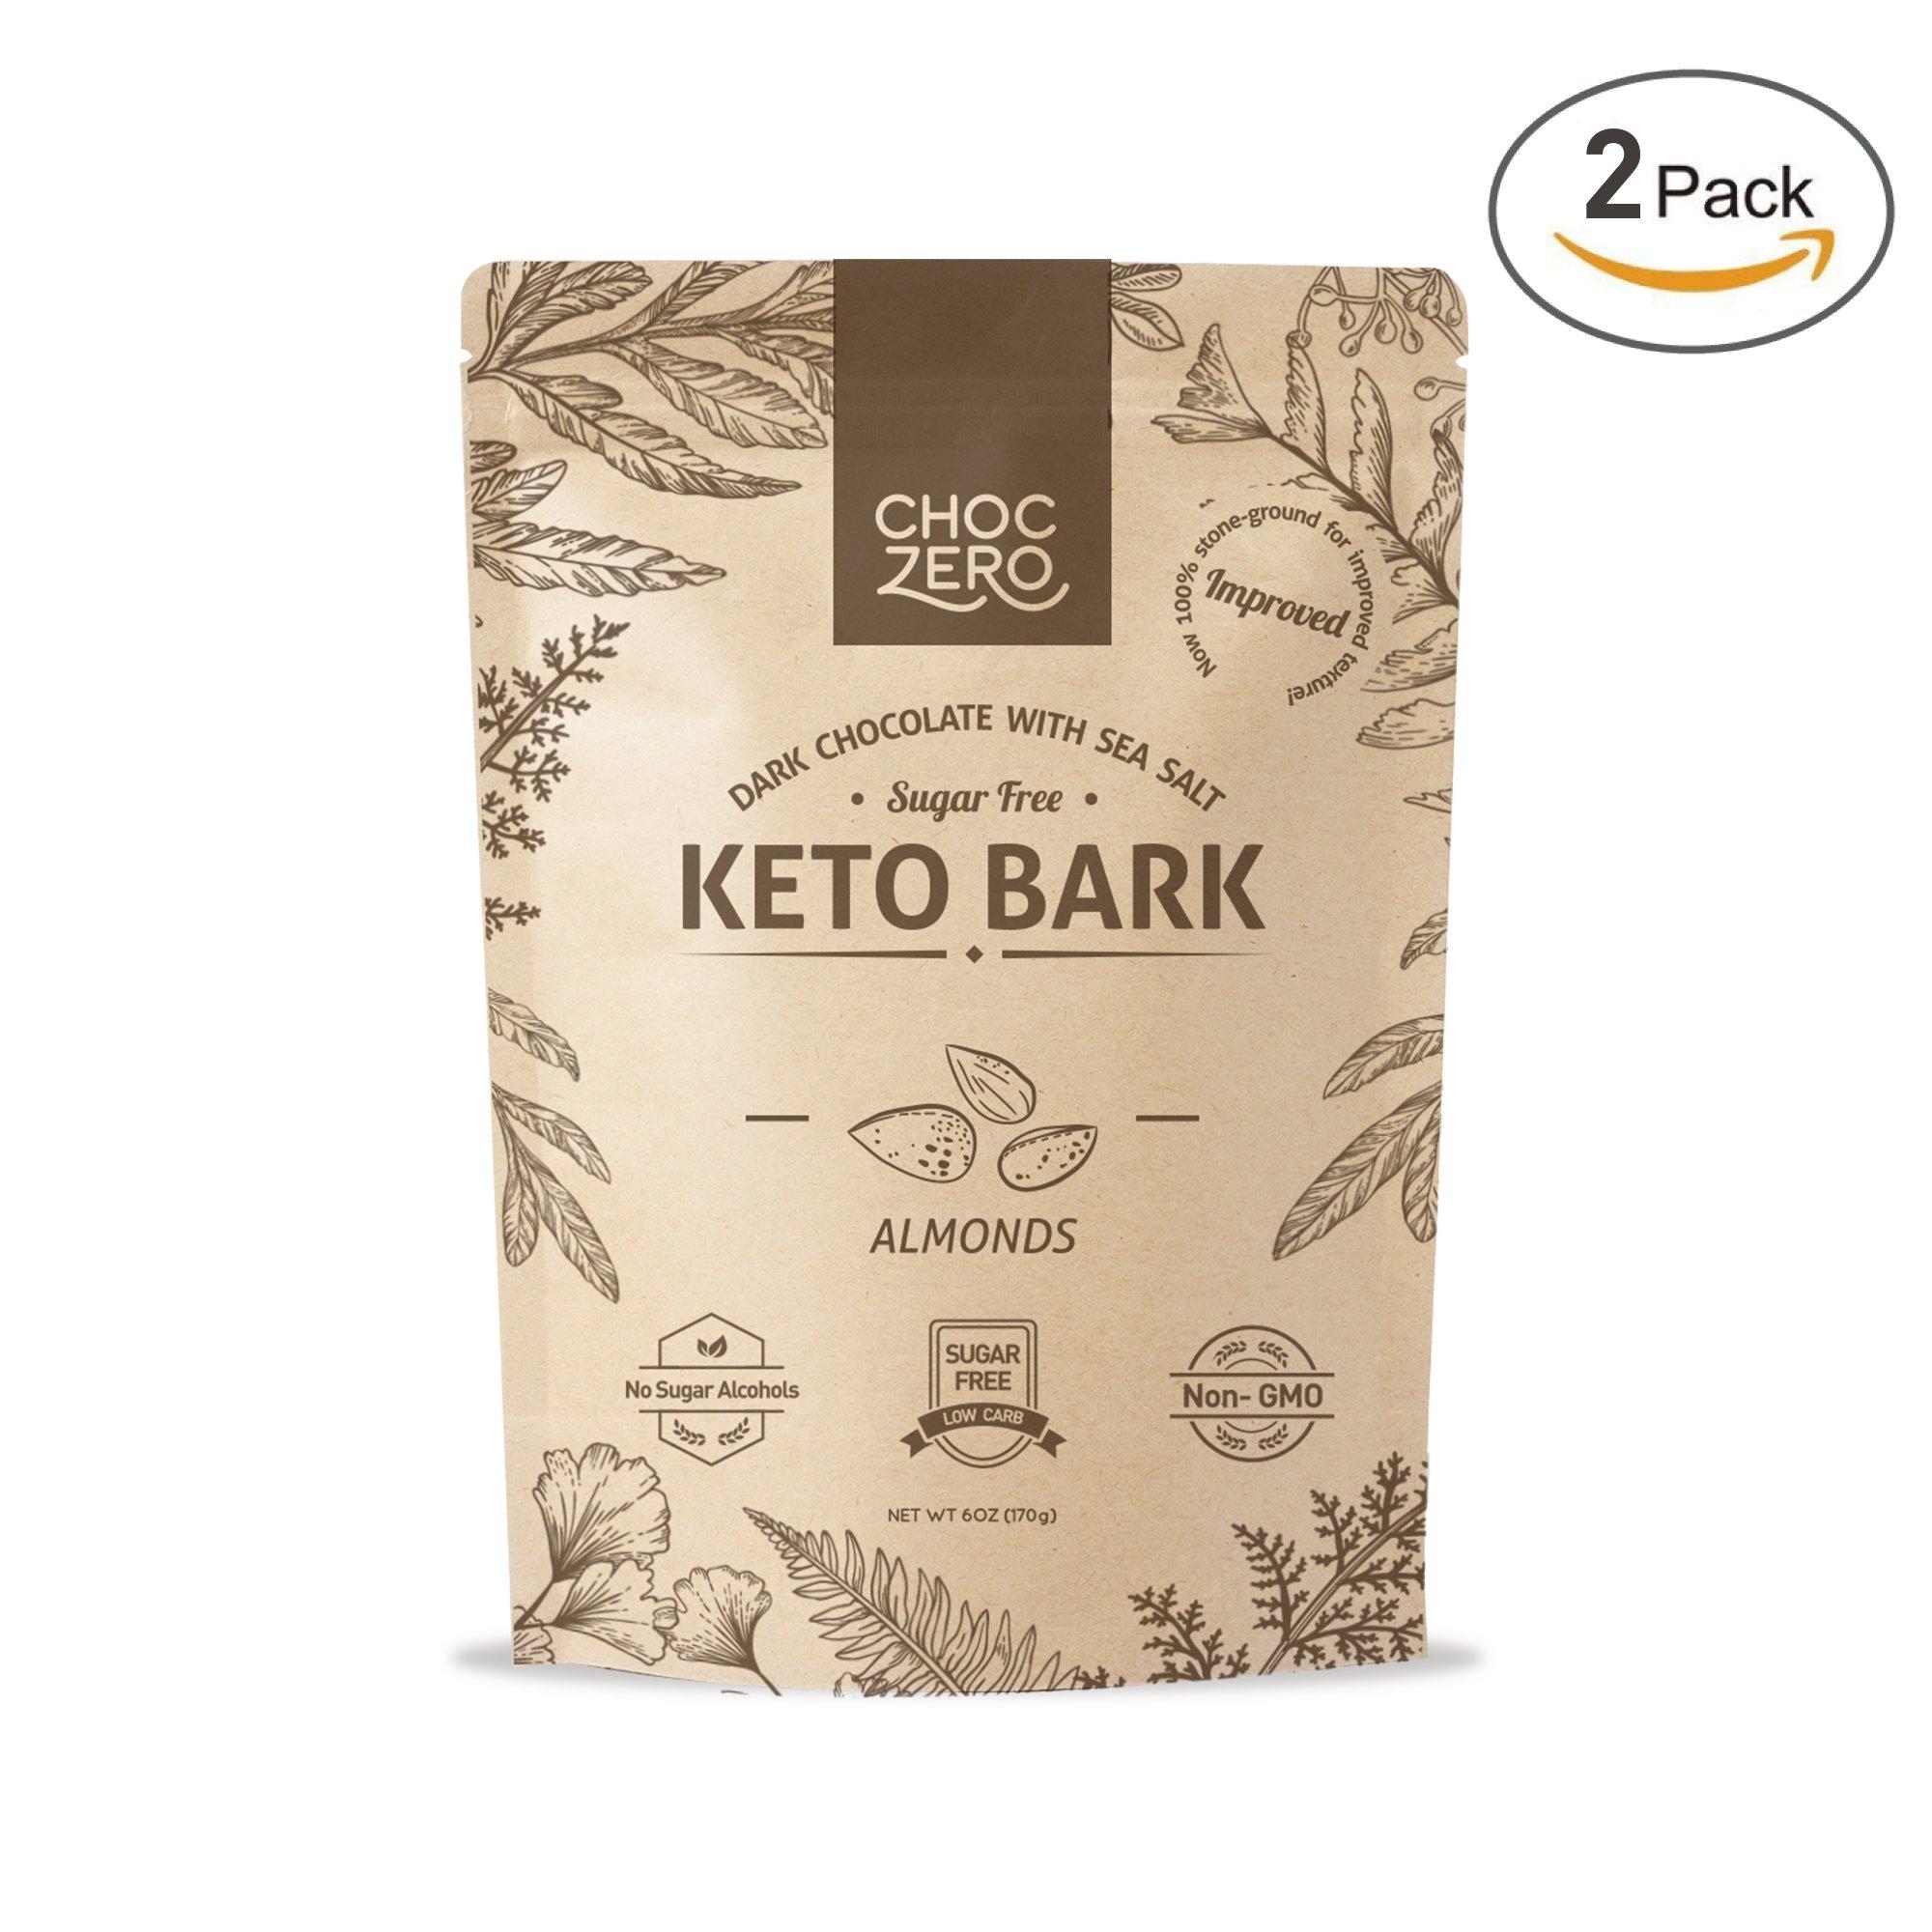 ChocZero's Keto Bark, Dark Chocolate Almonds with Sea Salt. 100% Stone-Ground, Sugar Free, Low Carb. No Sugar Alcohols, No Artificial Sweeteners, All Natural, Non-GMO (2 Bags)